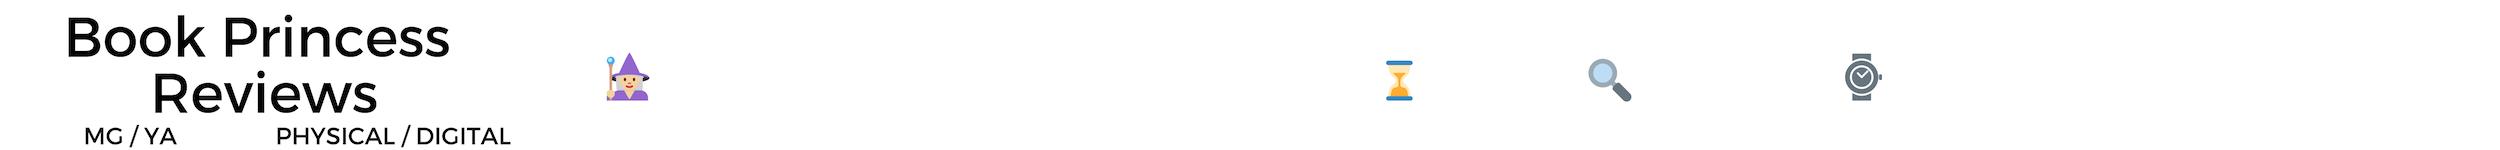 BOOK BLOG COMMUNITY _ BANNER + PROFILES [2500 x 150] (16).jpg